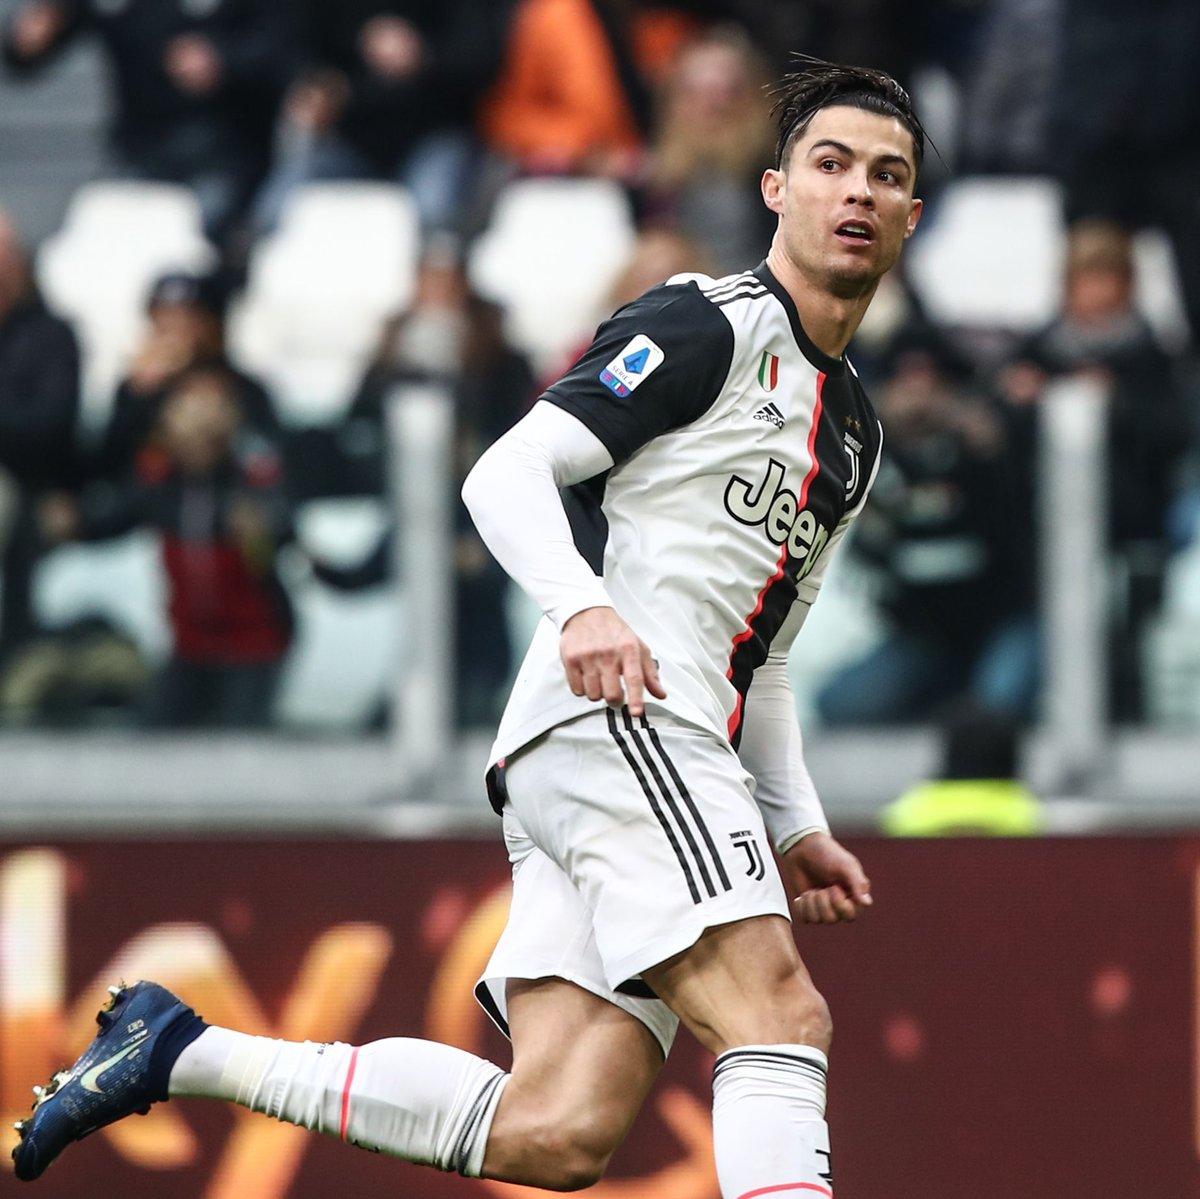 Cristiano Ronaldo doing what Cristiano Ronaldo does best.